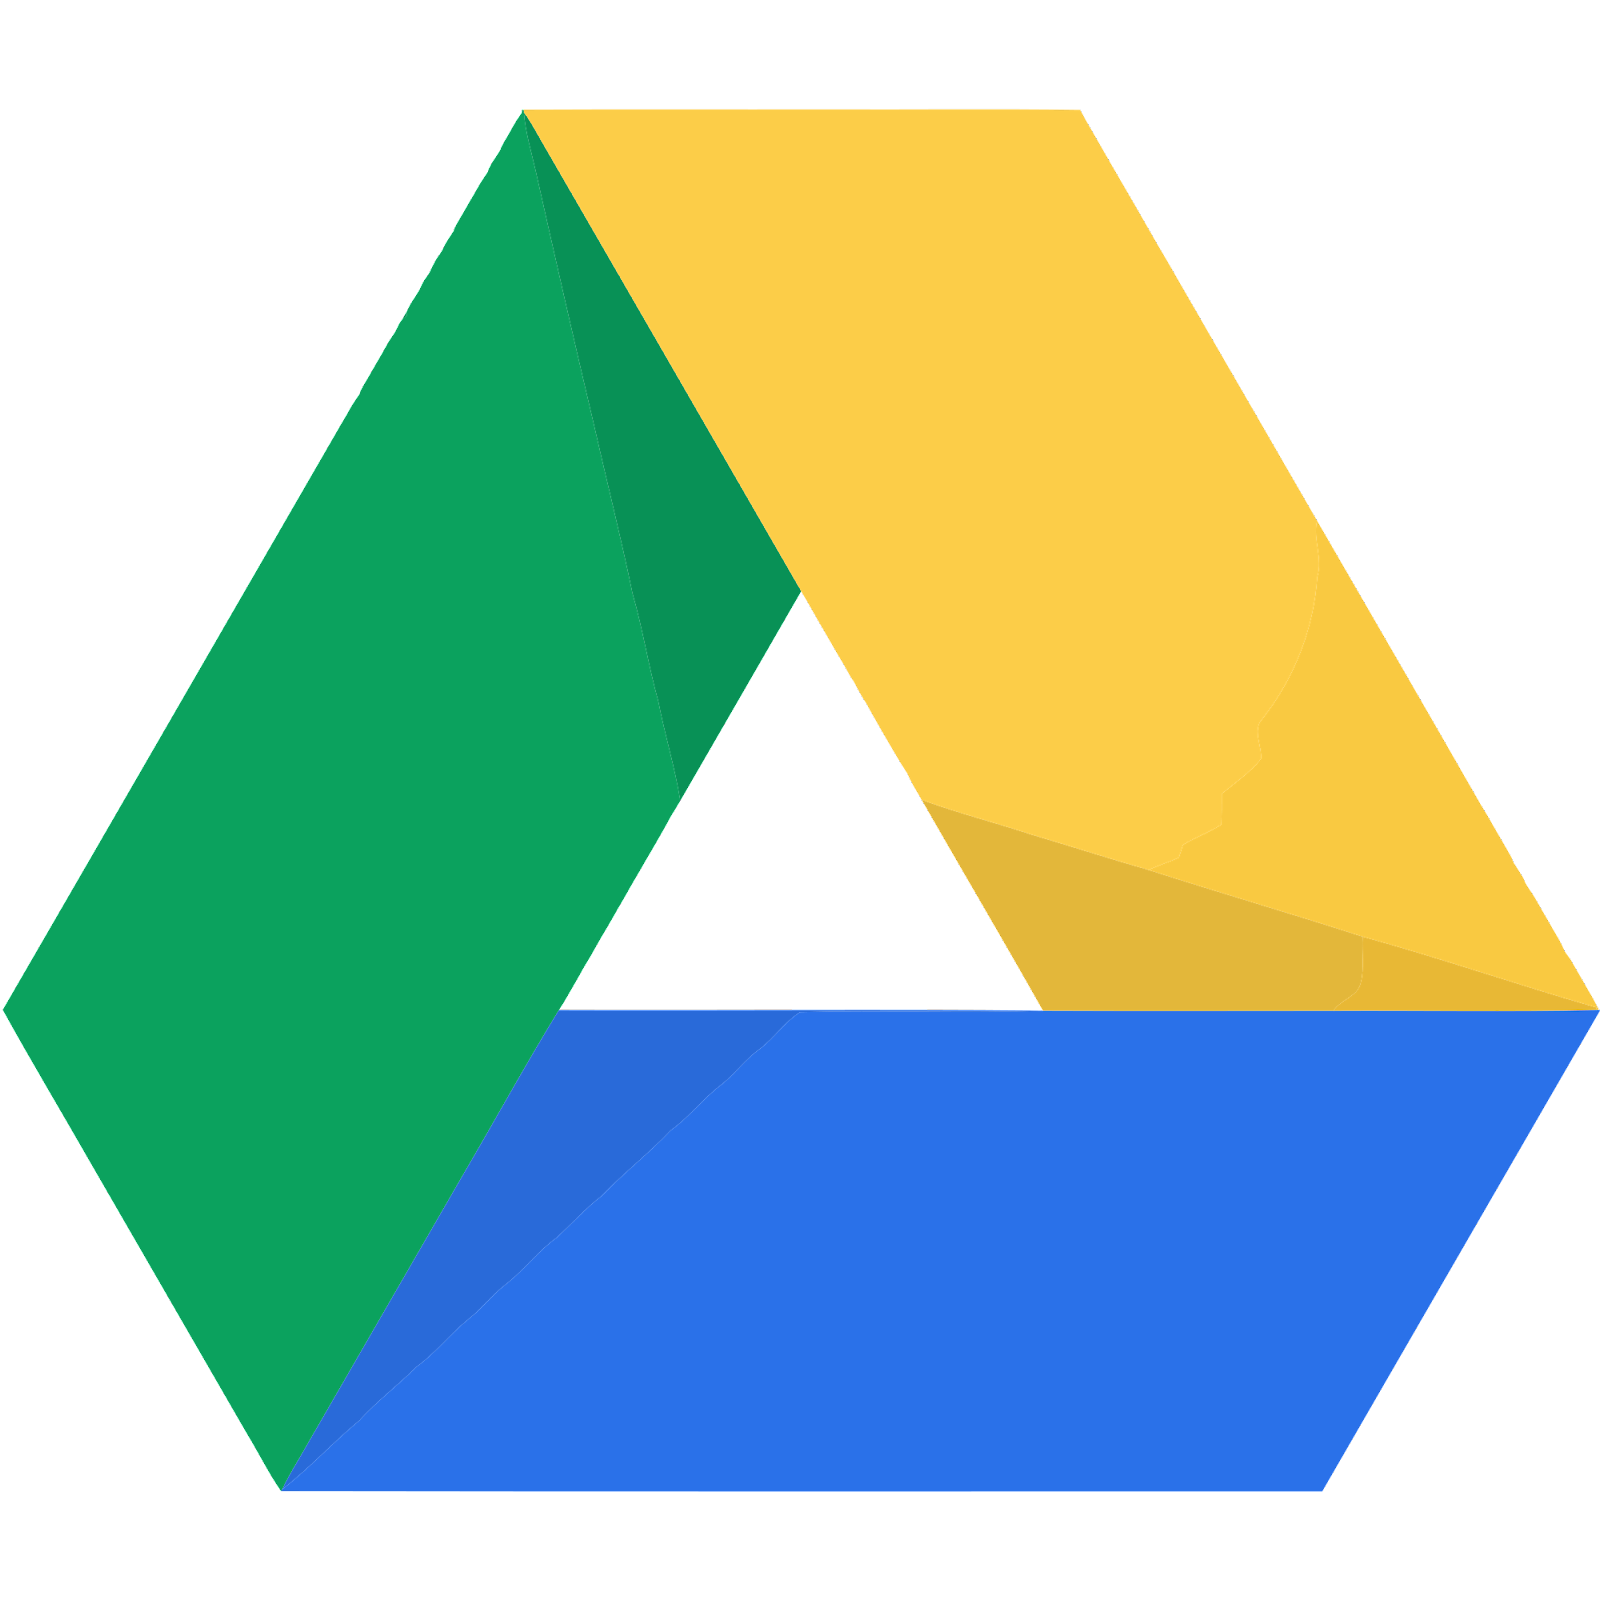 File:Logo of Google Drive.svg - Wikimedia Commons